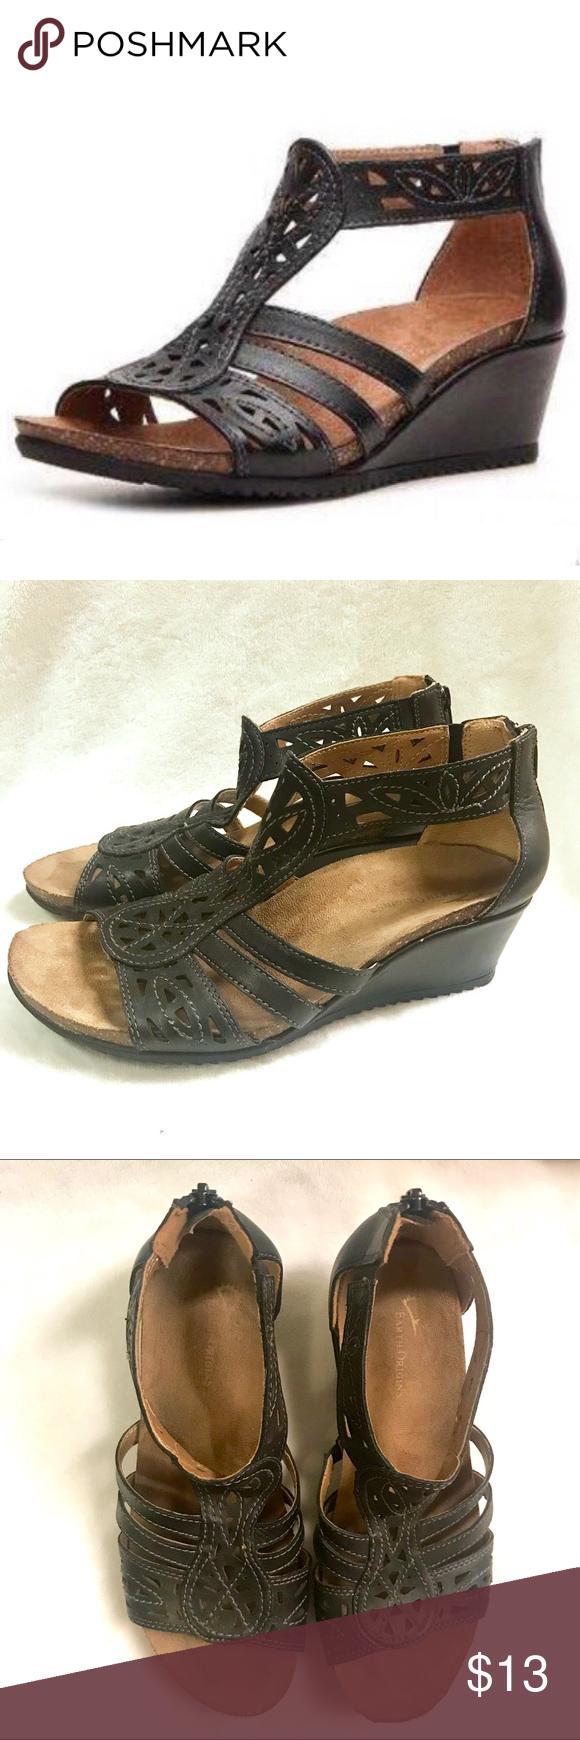 9cc85cfab71 Earth Origins Gladiator Sandals size 8 Earth Origins Kingsley Gladiator  Sandals size 8 Run true to